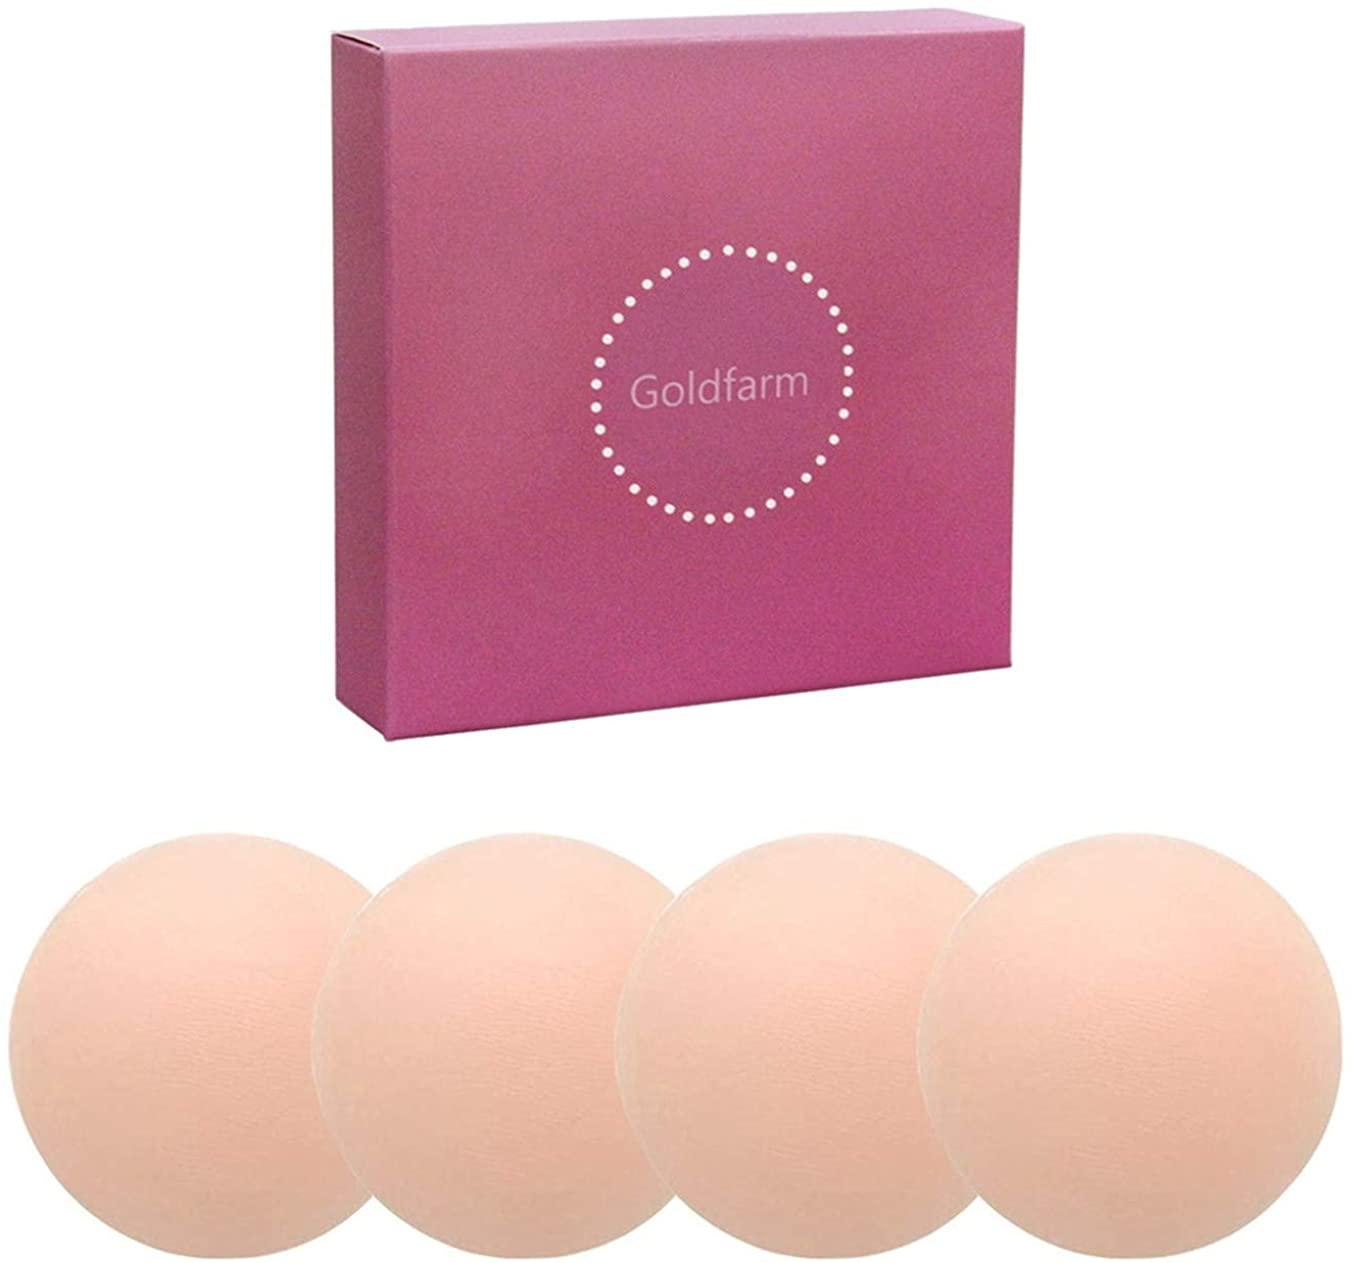 Nippleless Covers, Pasties, Silicone Reusable Breast Pasties Adhesive Bra 2 Pairs Round (2)